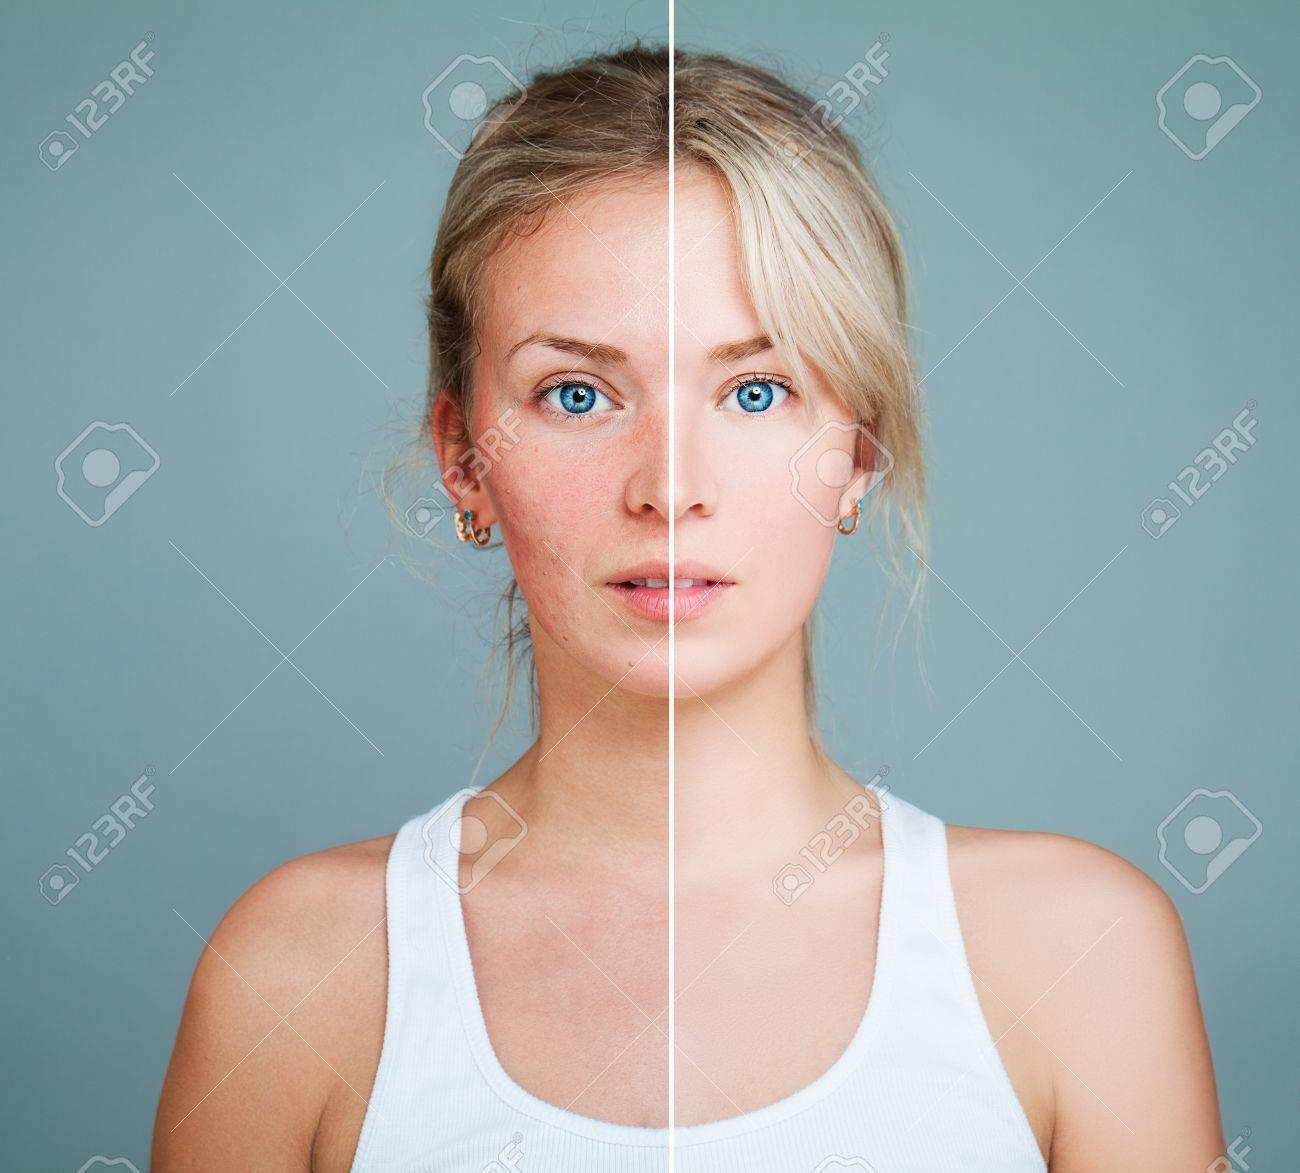 http://n3.datasn.io/data/api/v1/n3zm/image_of_skin_disease_5/main/skin_disease_image_download//b7/c3/f7/1e/b7c3f71e43571ba34aad9369e90a6da41353a651.jpg